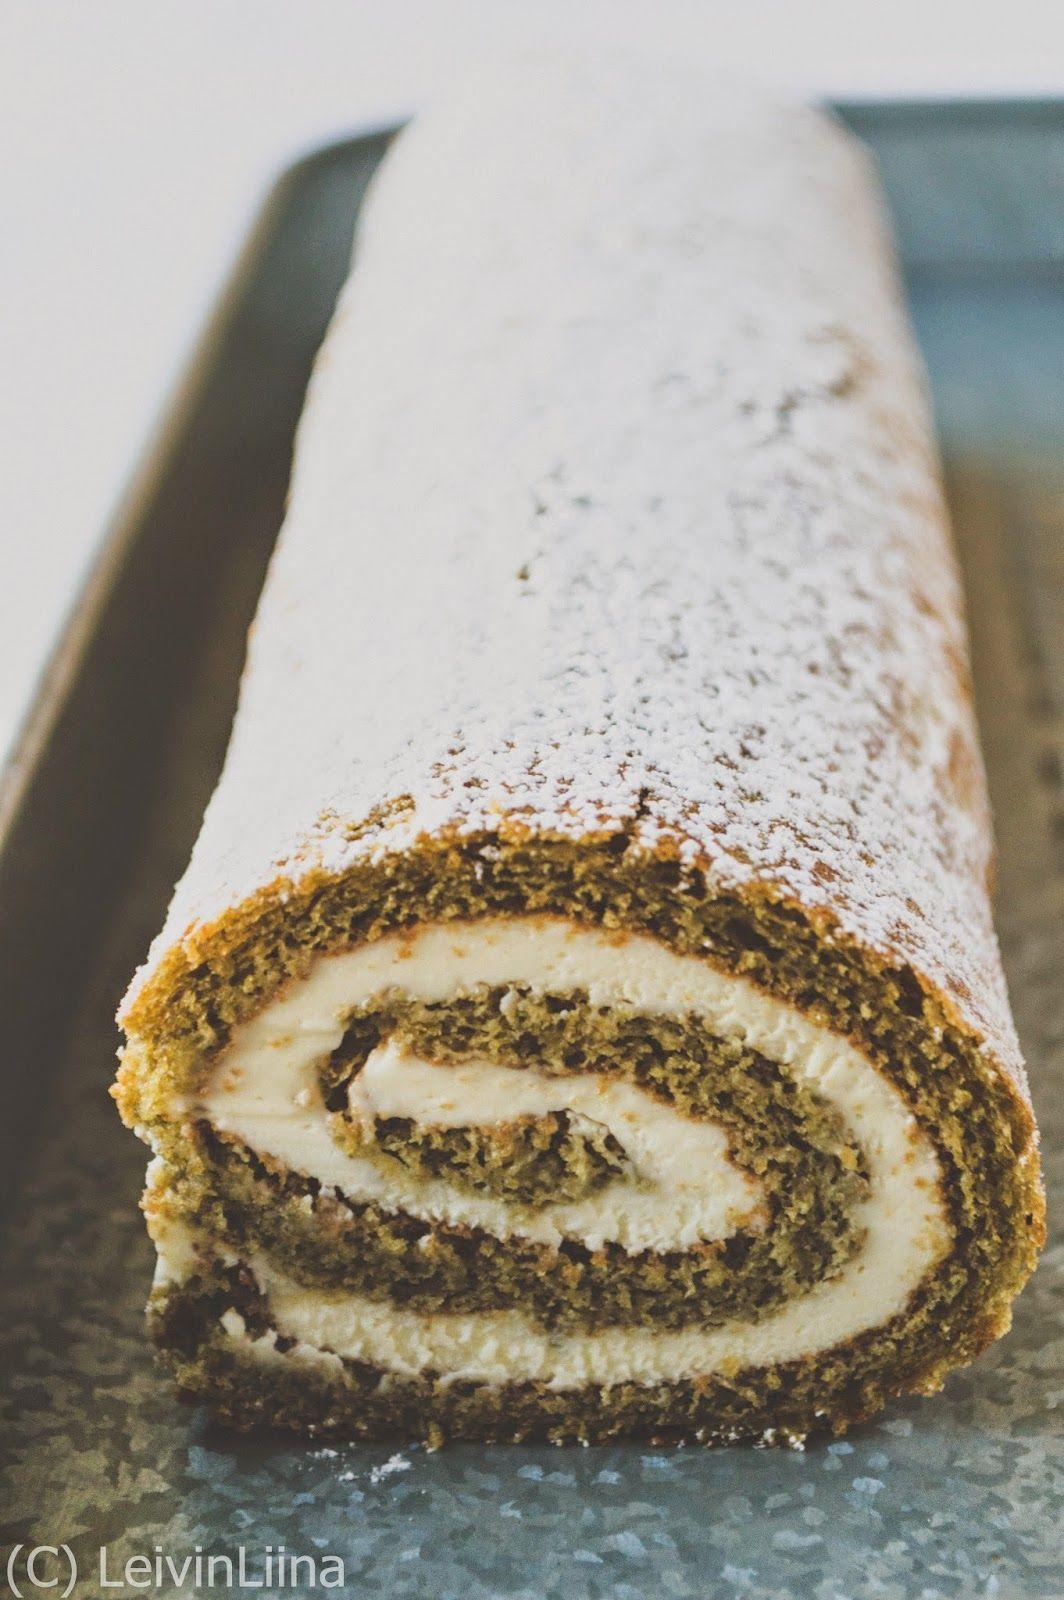 LeivinLiina: Matcha Roll Cake -kääretorttu